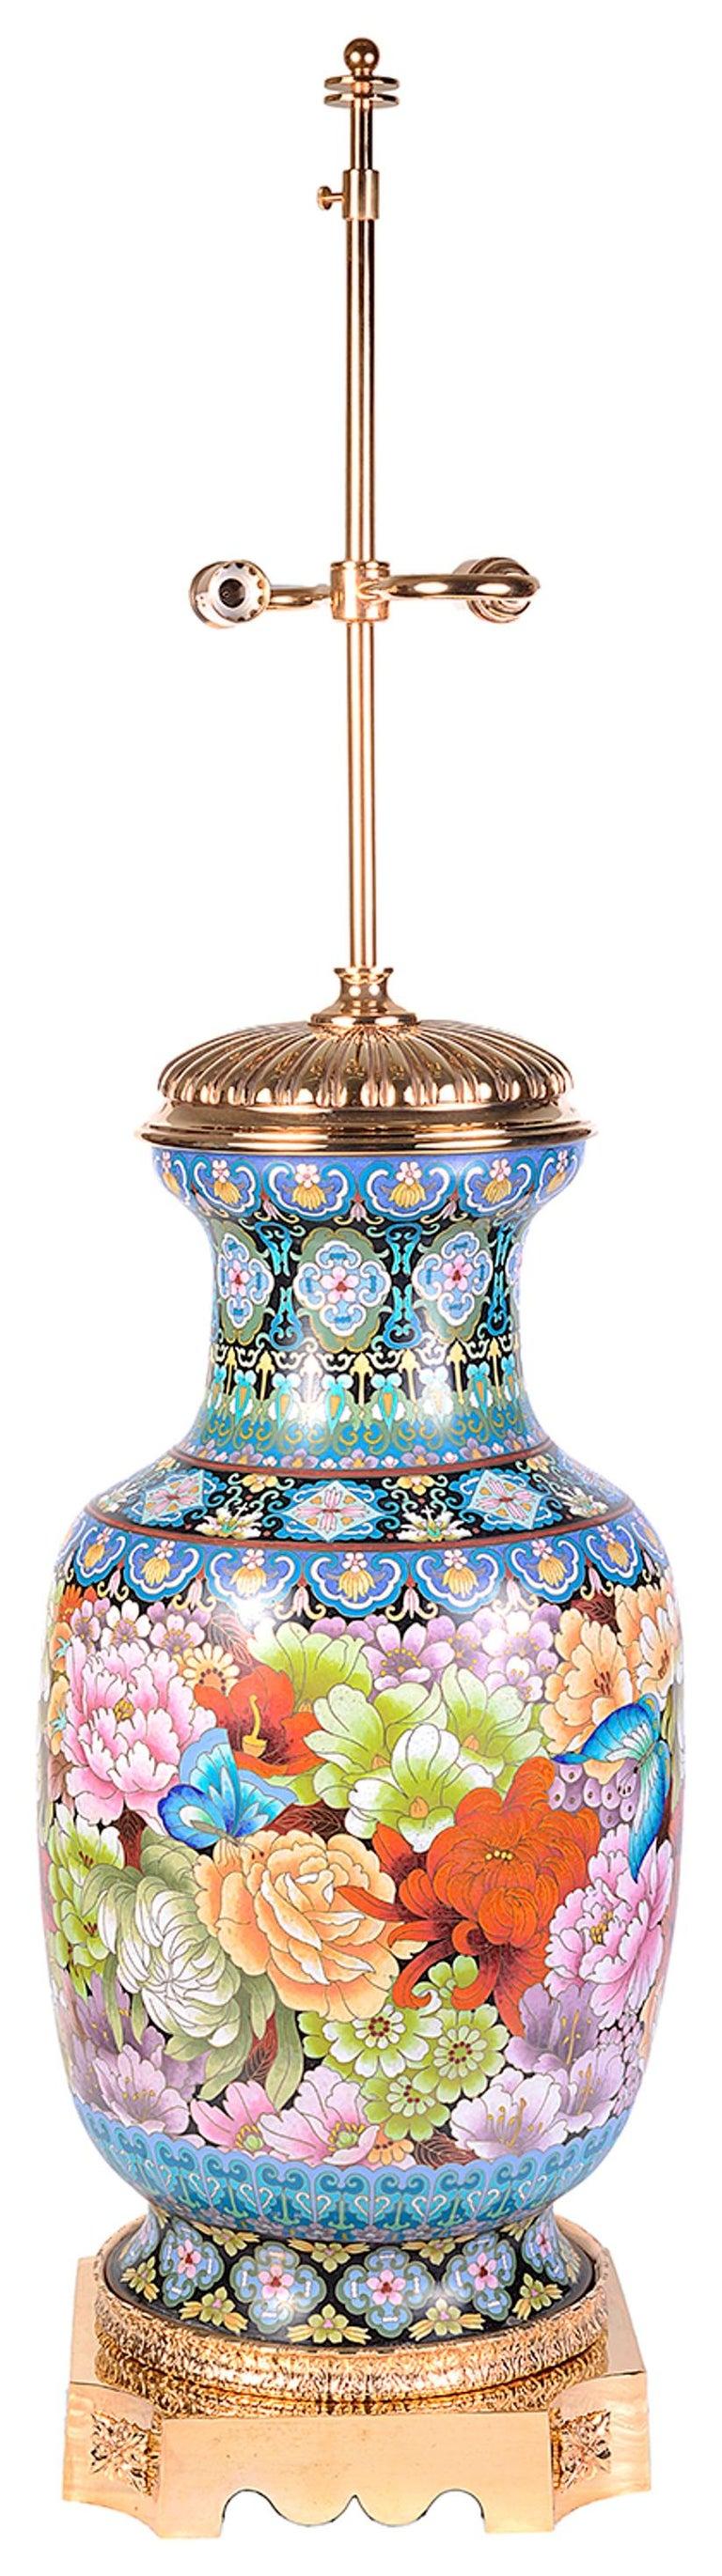 Pair of Cloisonne Enamel Vases/Lamps, circa 1920 For Sale 1